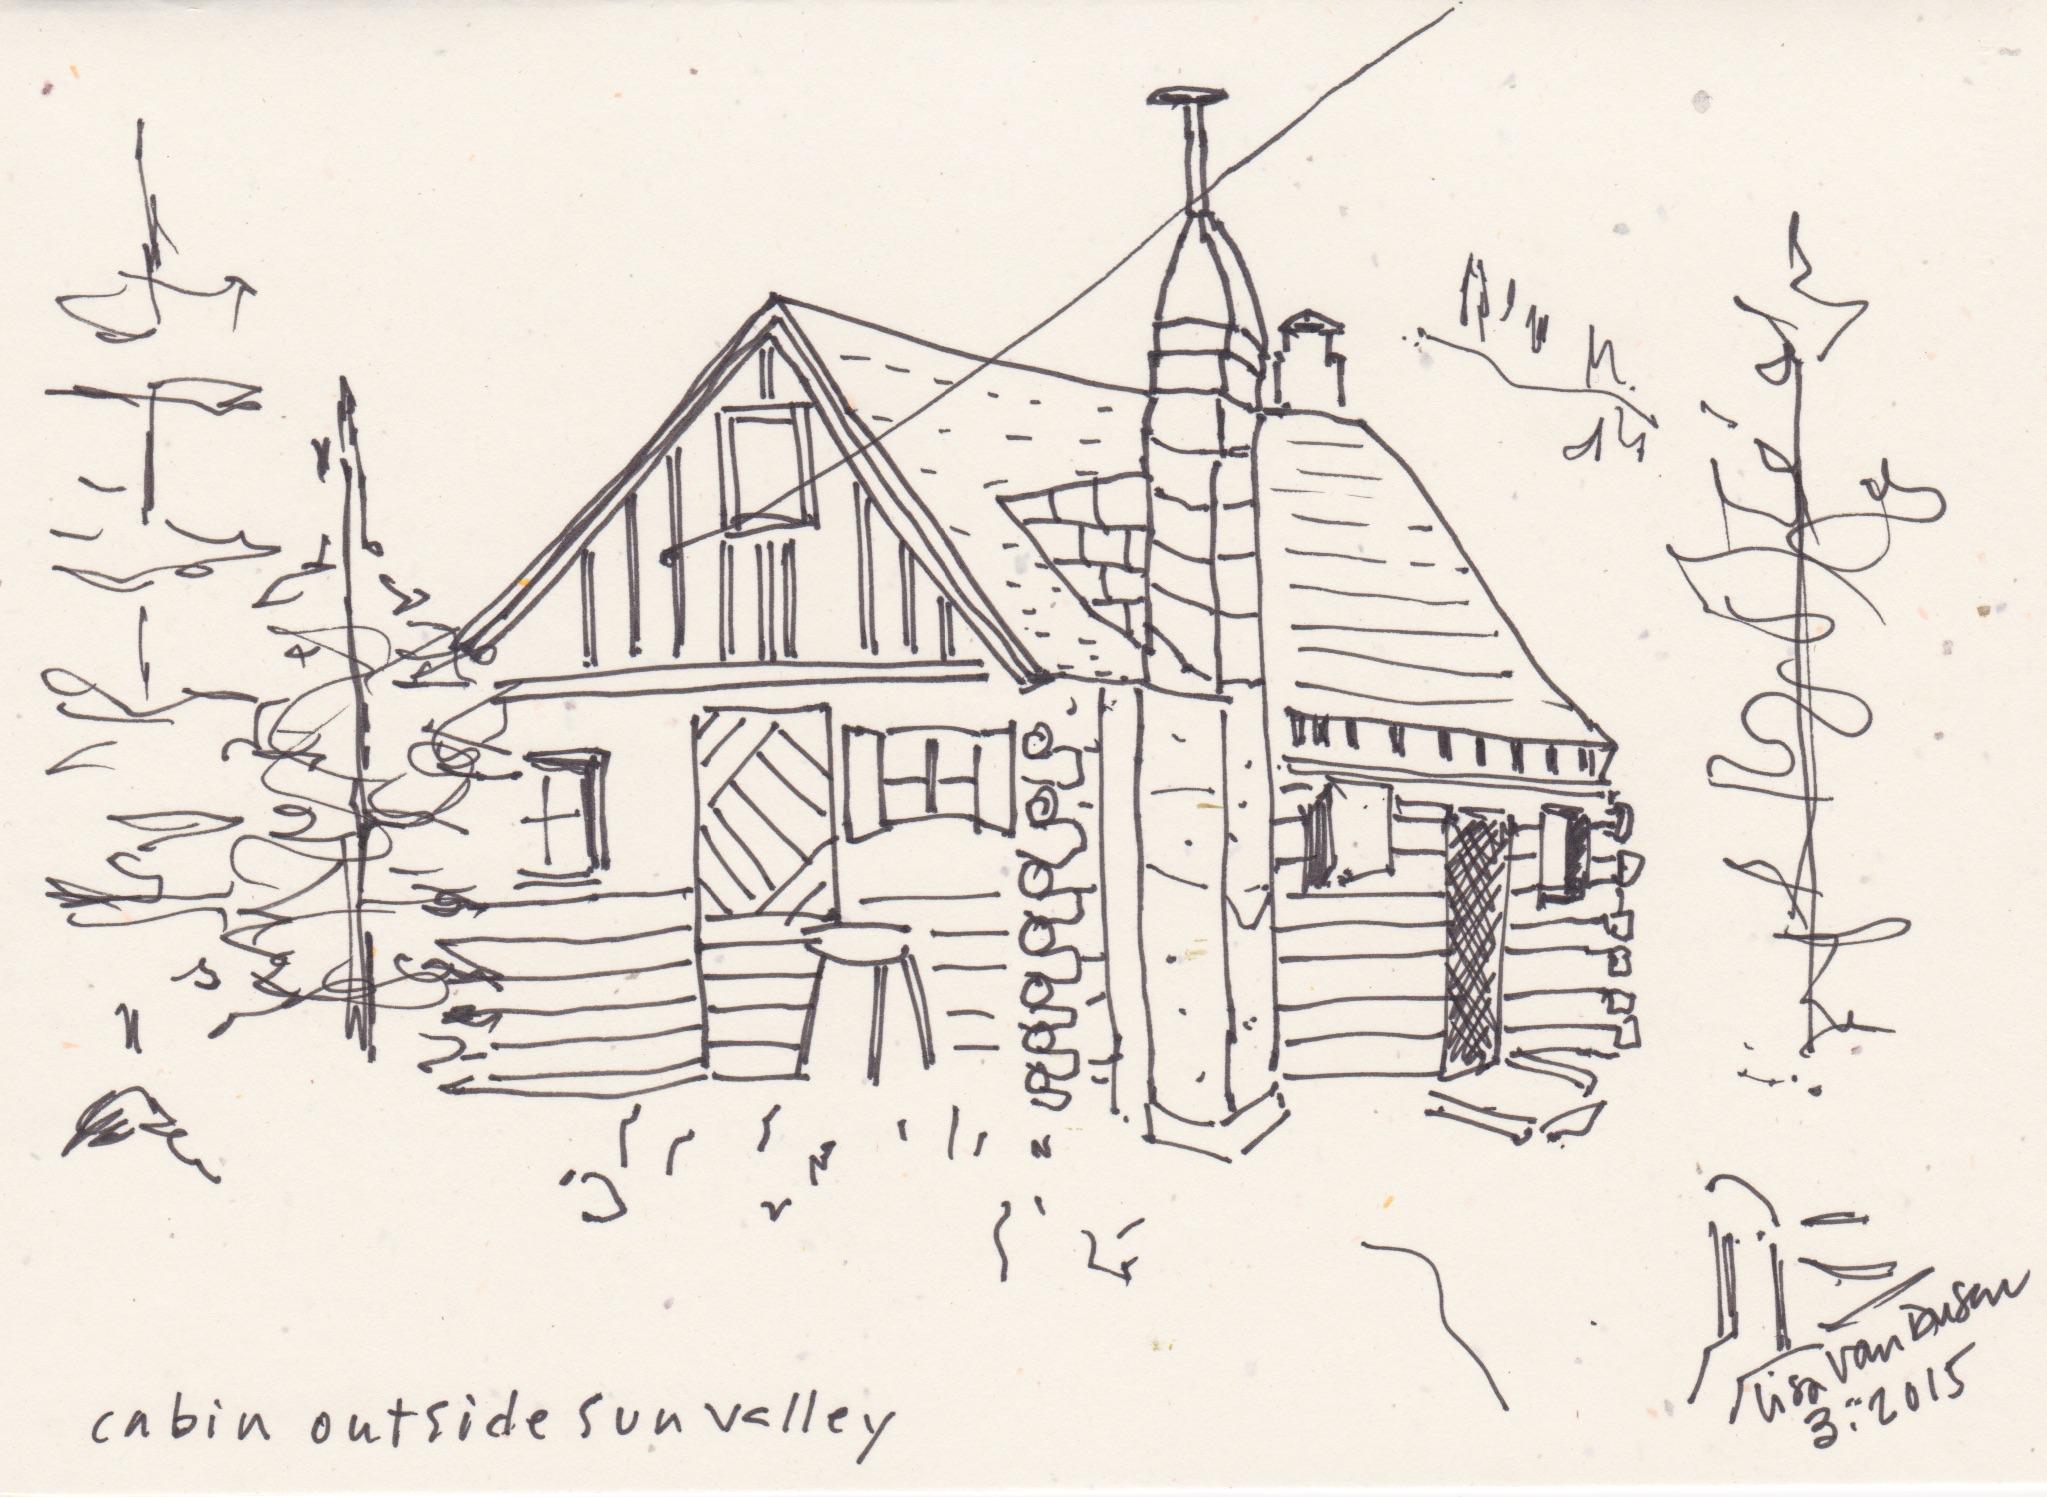 Cabin outside Sun Valley - byron_julie's 3_15_15.jpg